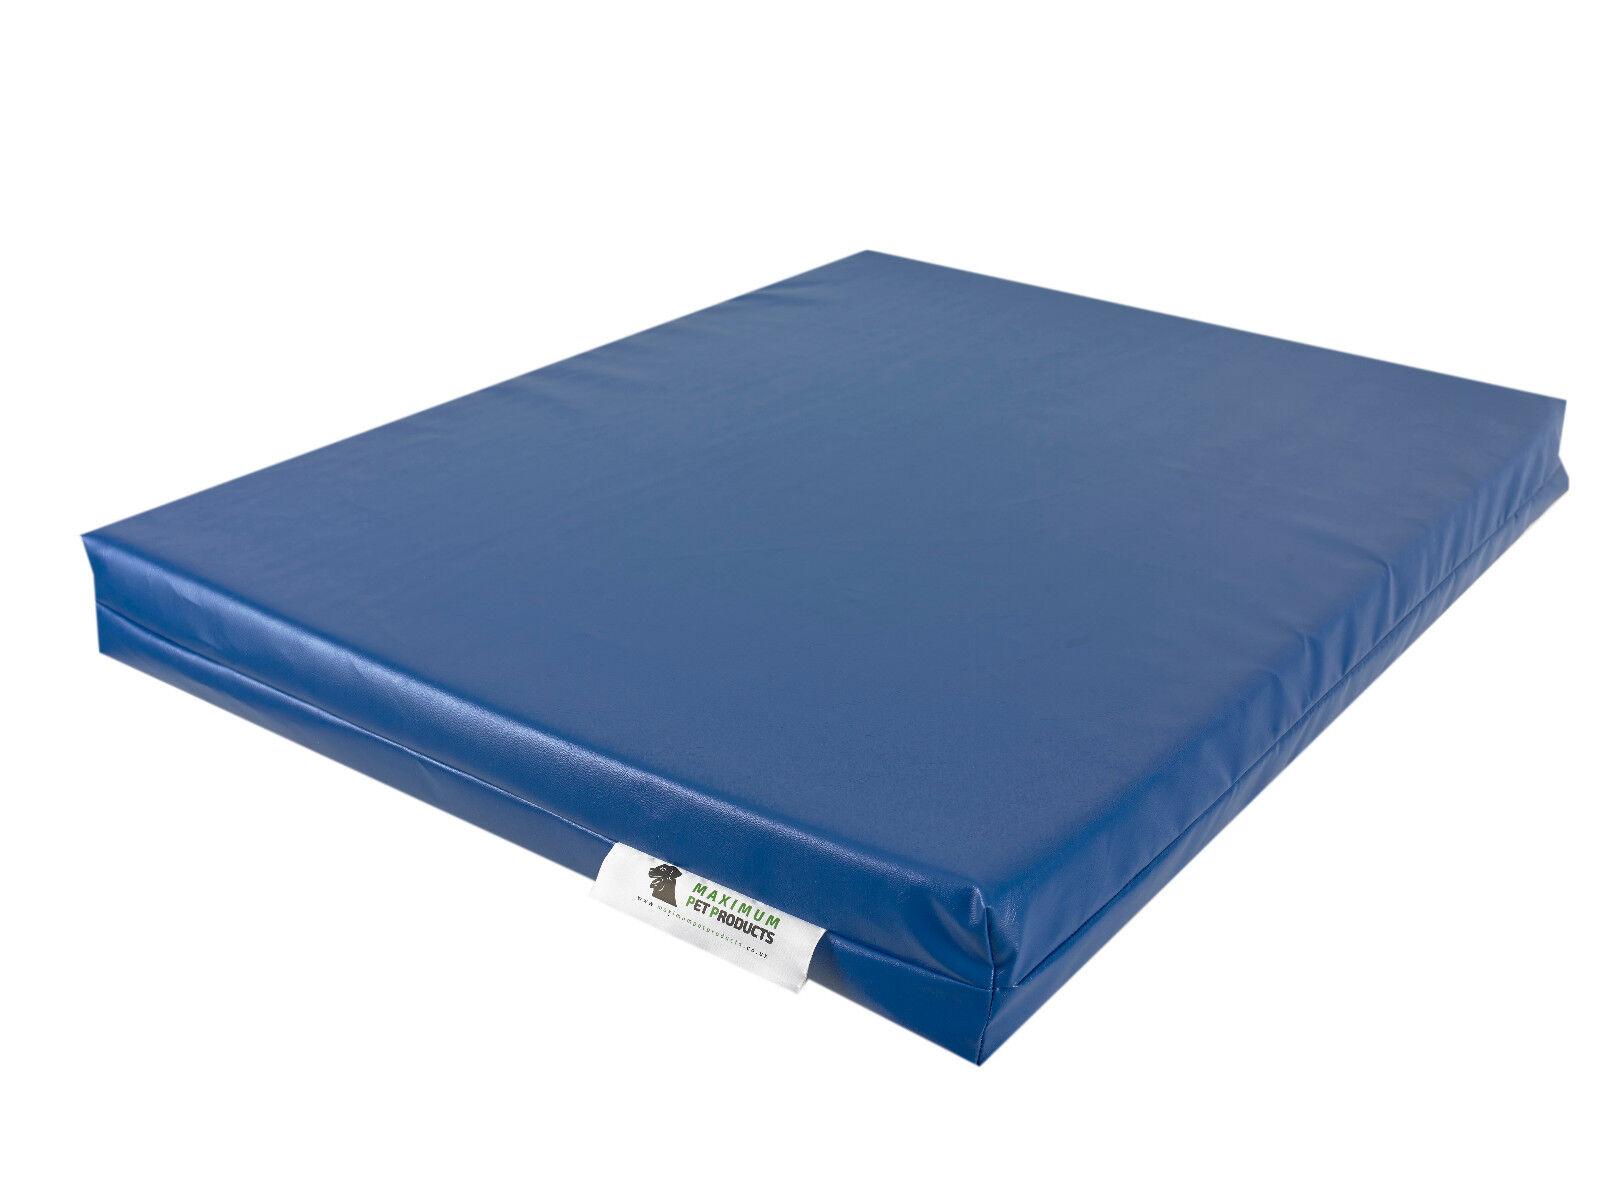 Blau Chew Resistant Dog Bed Extra Large XL Waterproof Heavy Duty